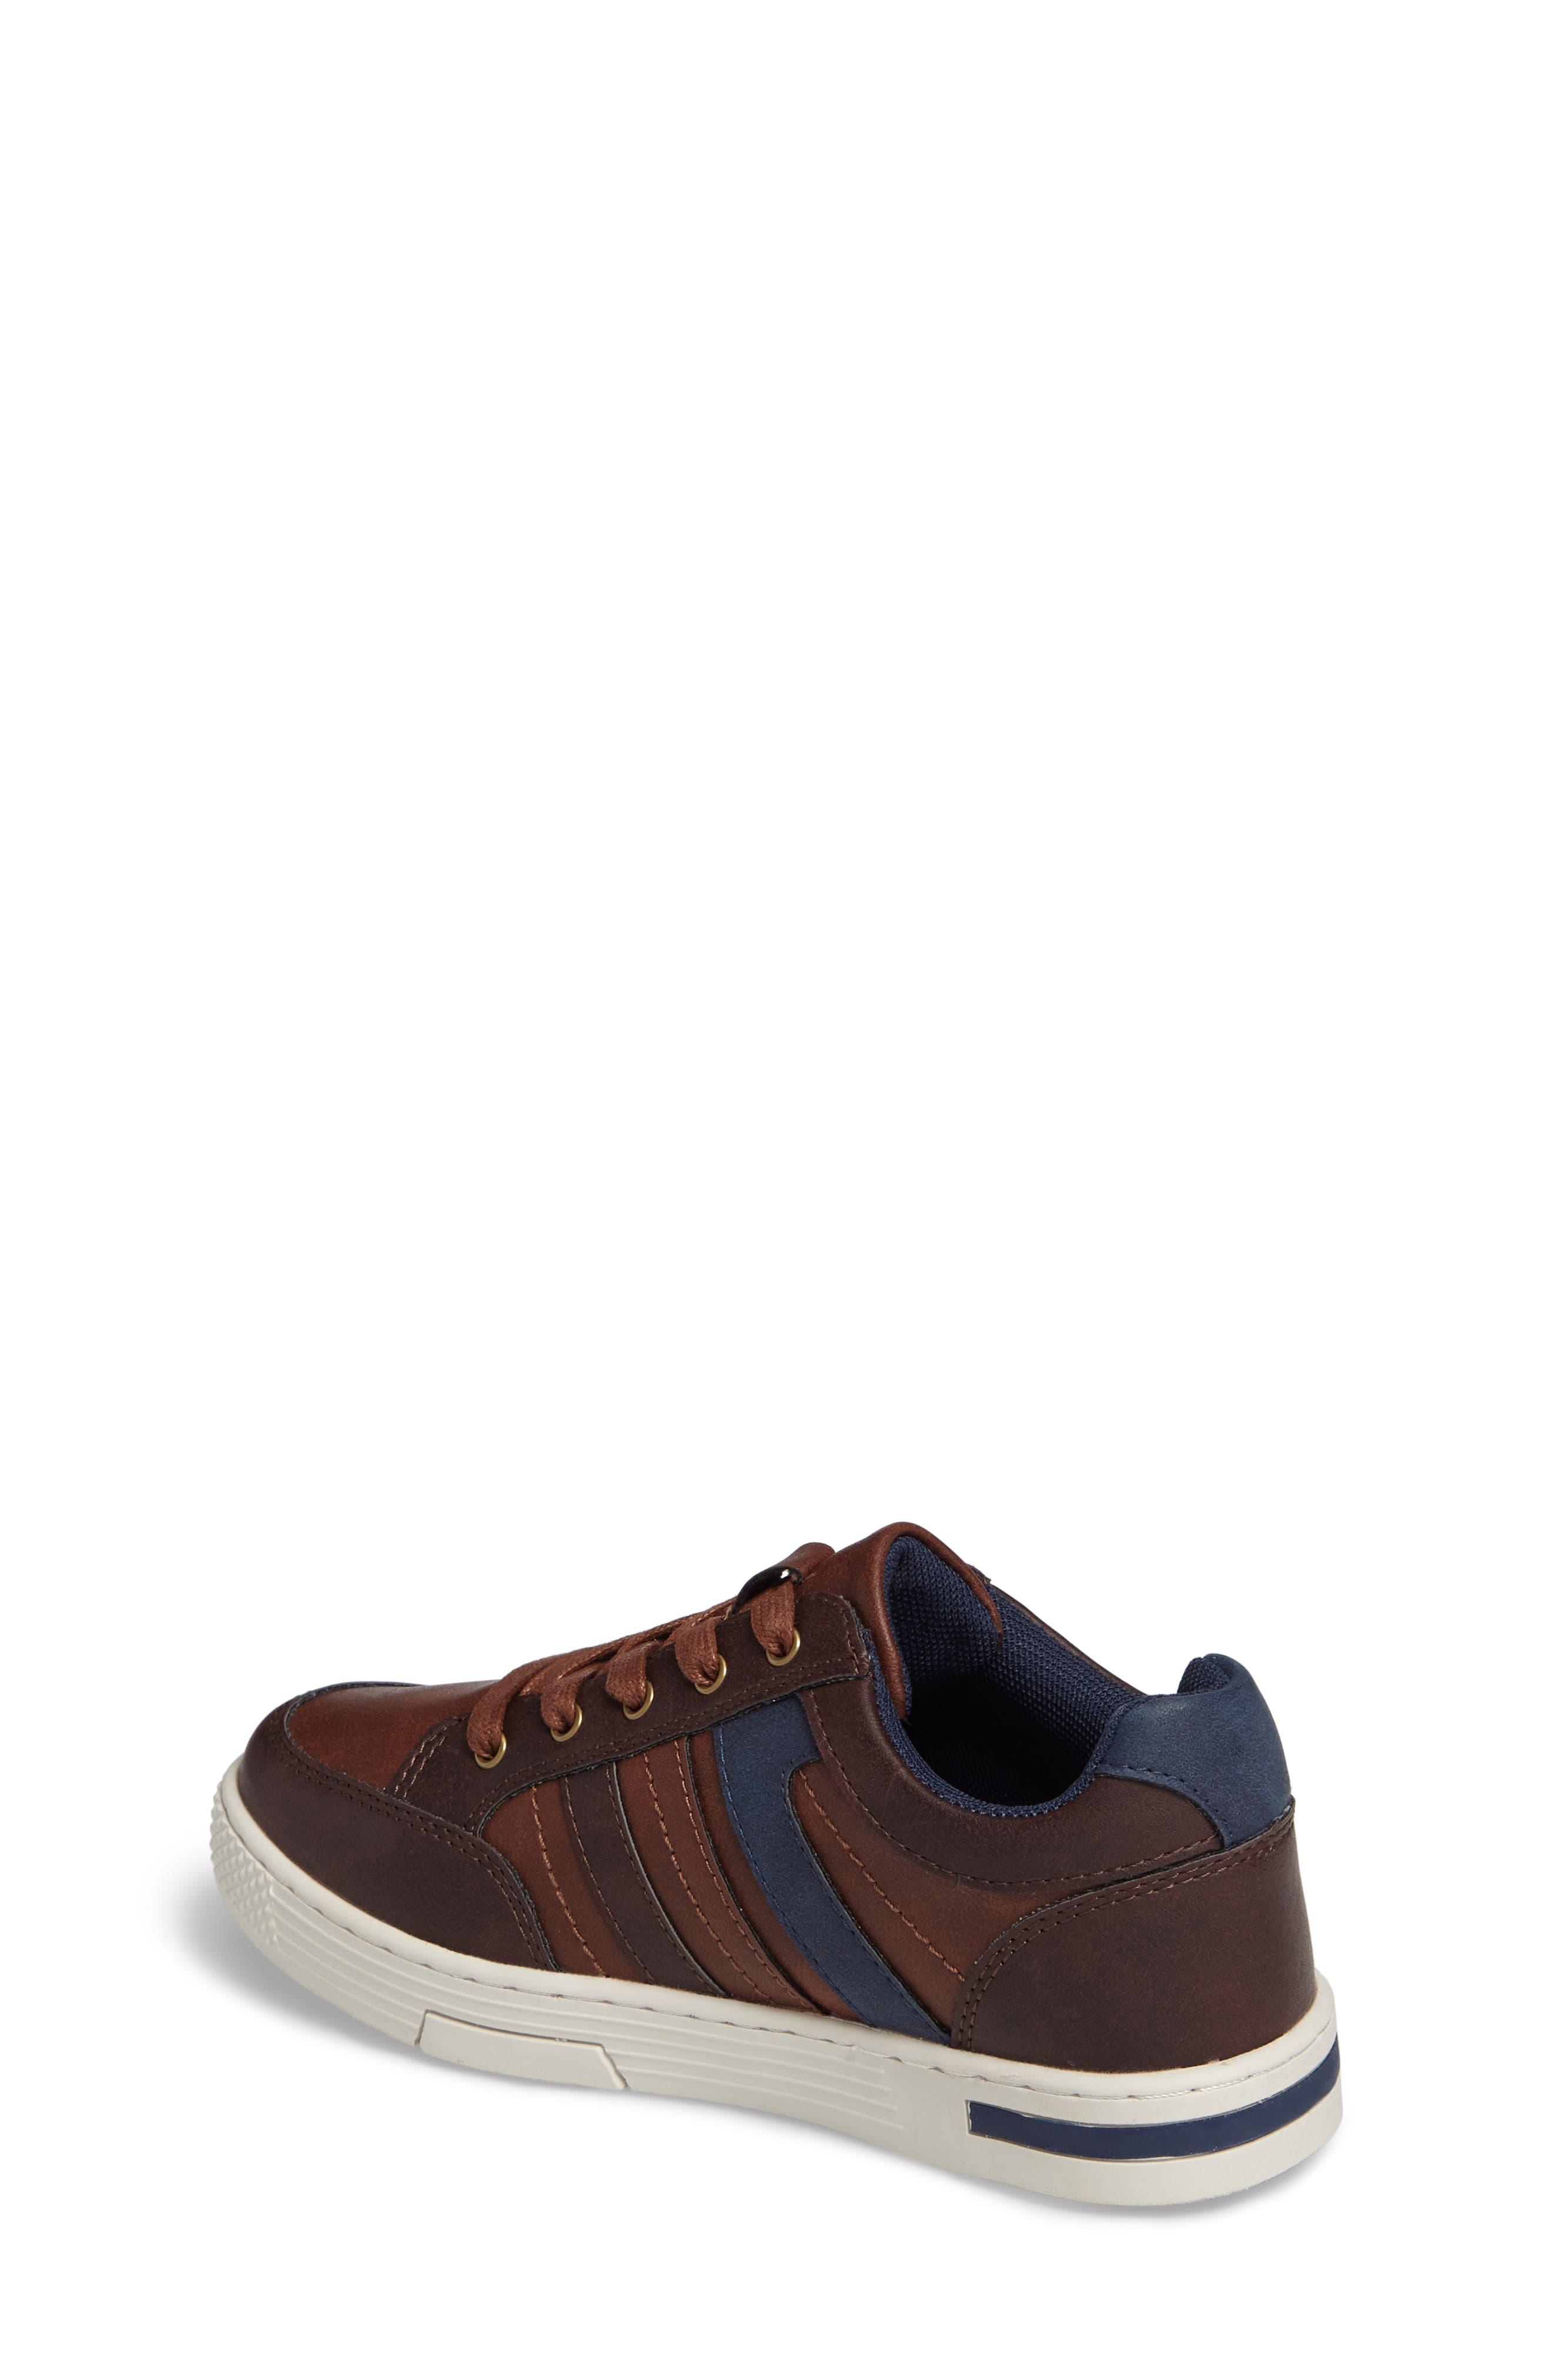 Trakk Sneaker,                             Alternate thumbnail 2, color,                             Brown Multi